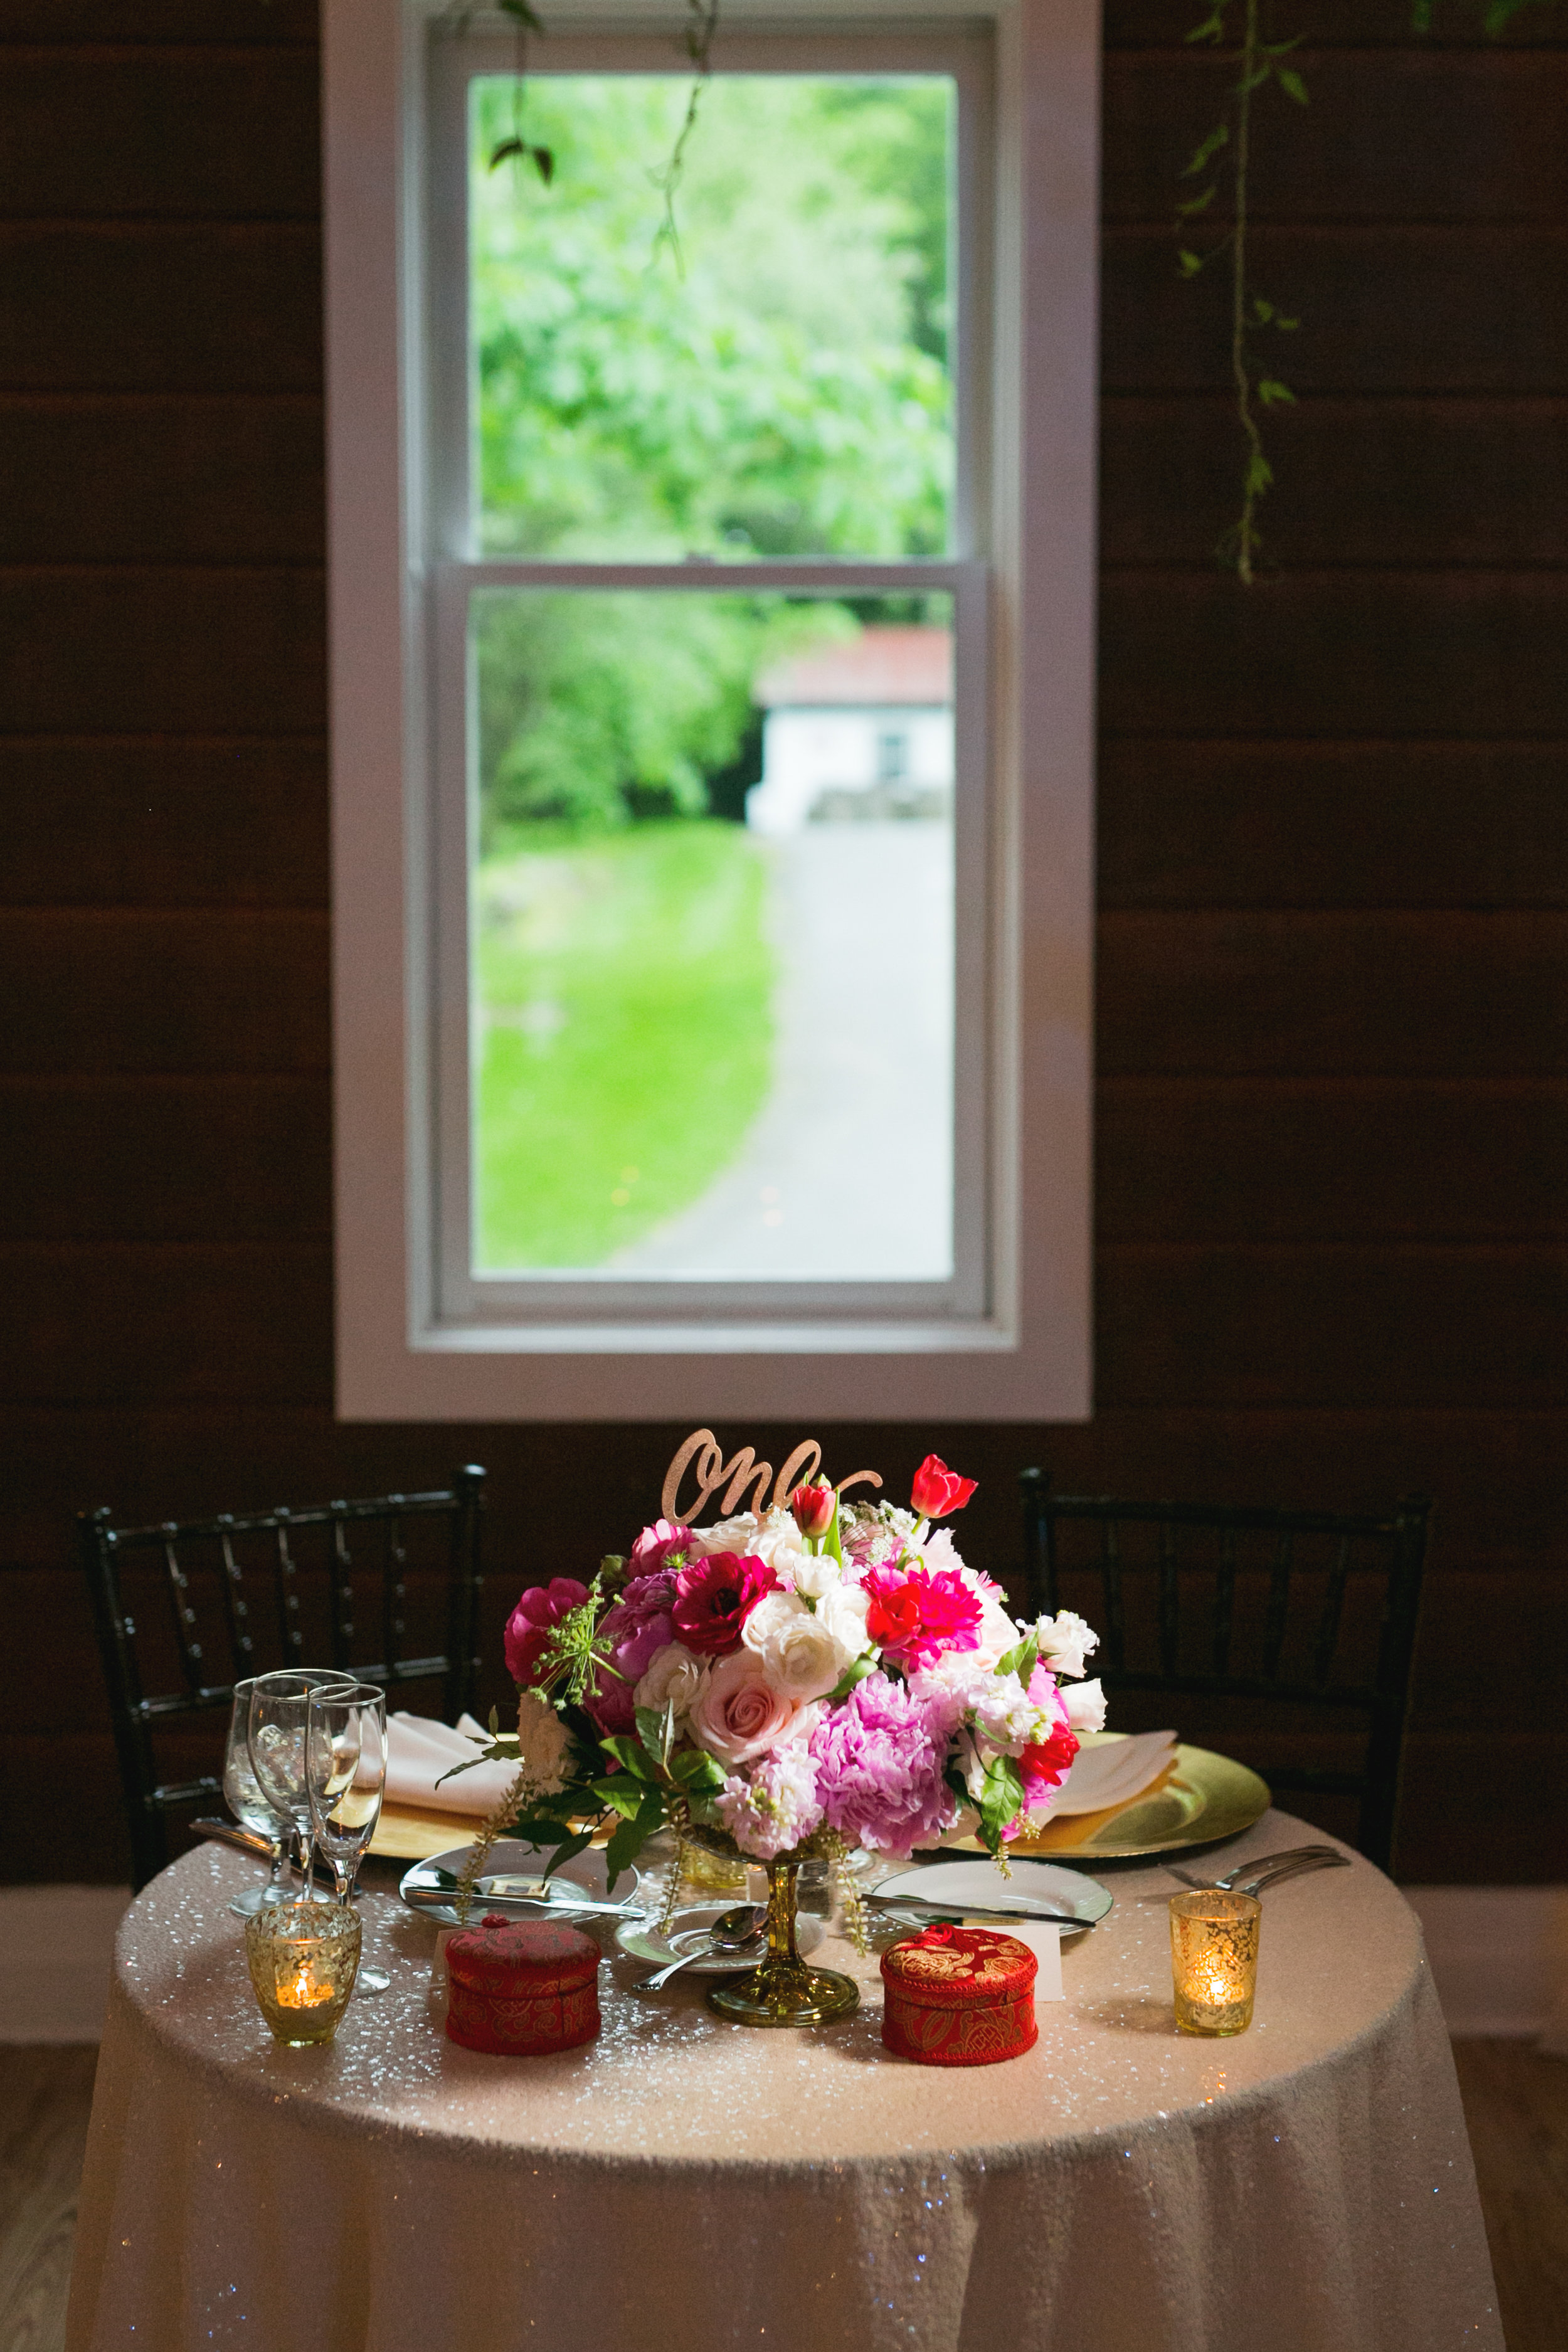 Pink and red wedding flower centerpiece